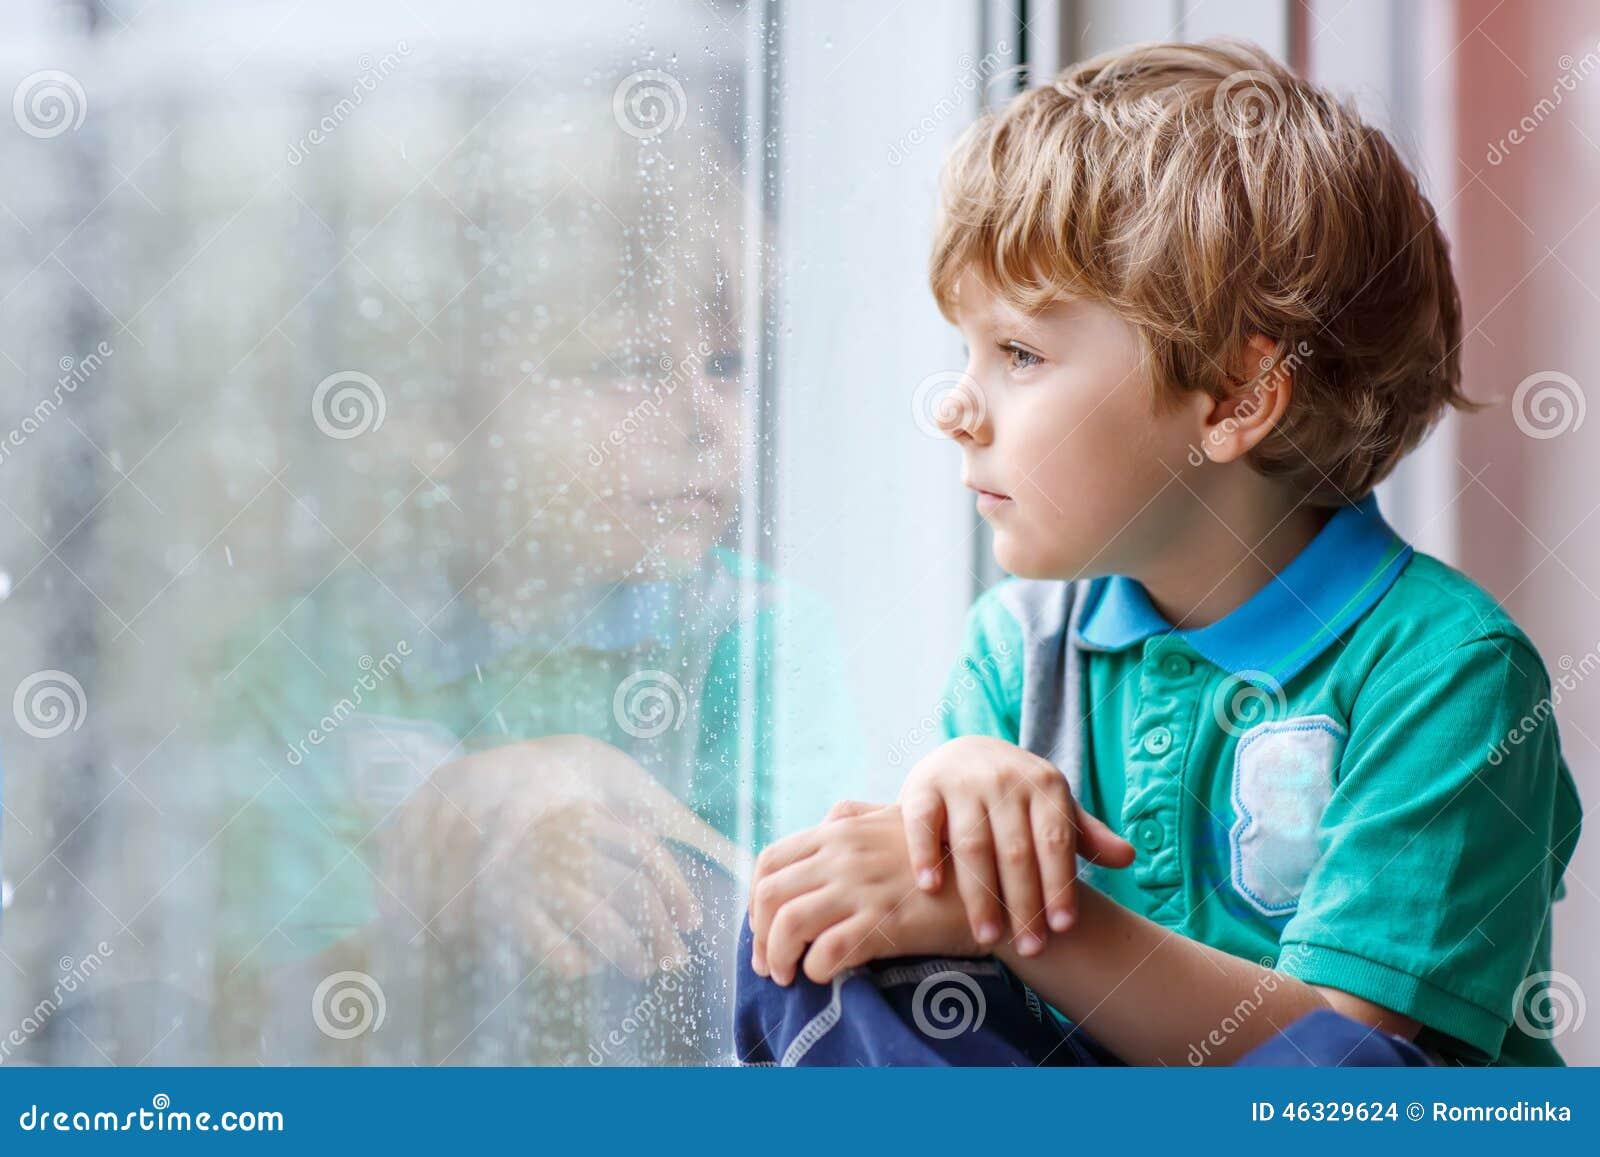 little blond kid boy sitting near window and looking on